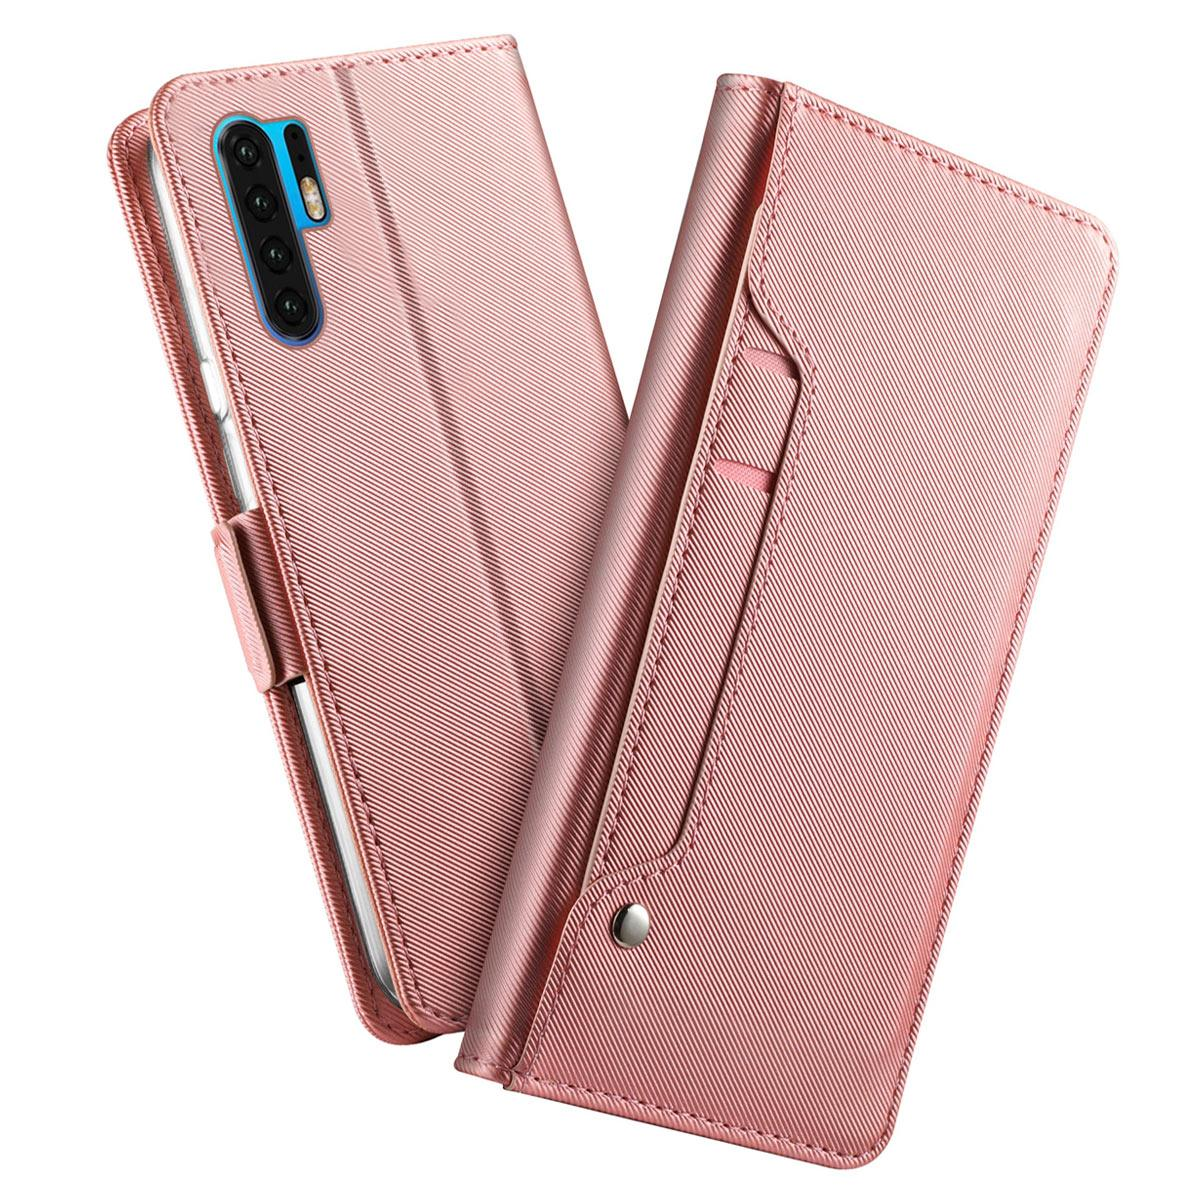 Lommebokdeksel Speil Huawei P30 Pro Rosa Gull